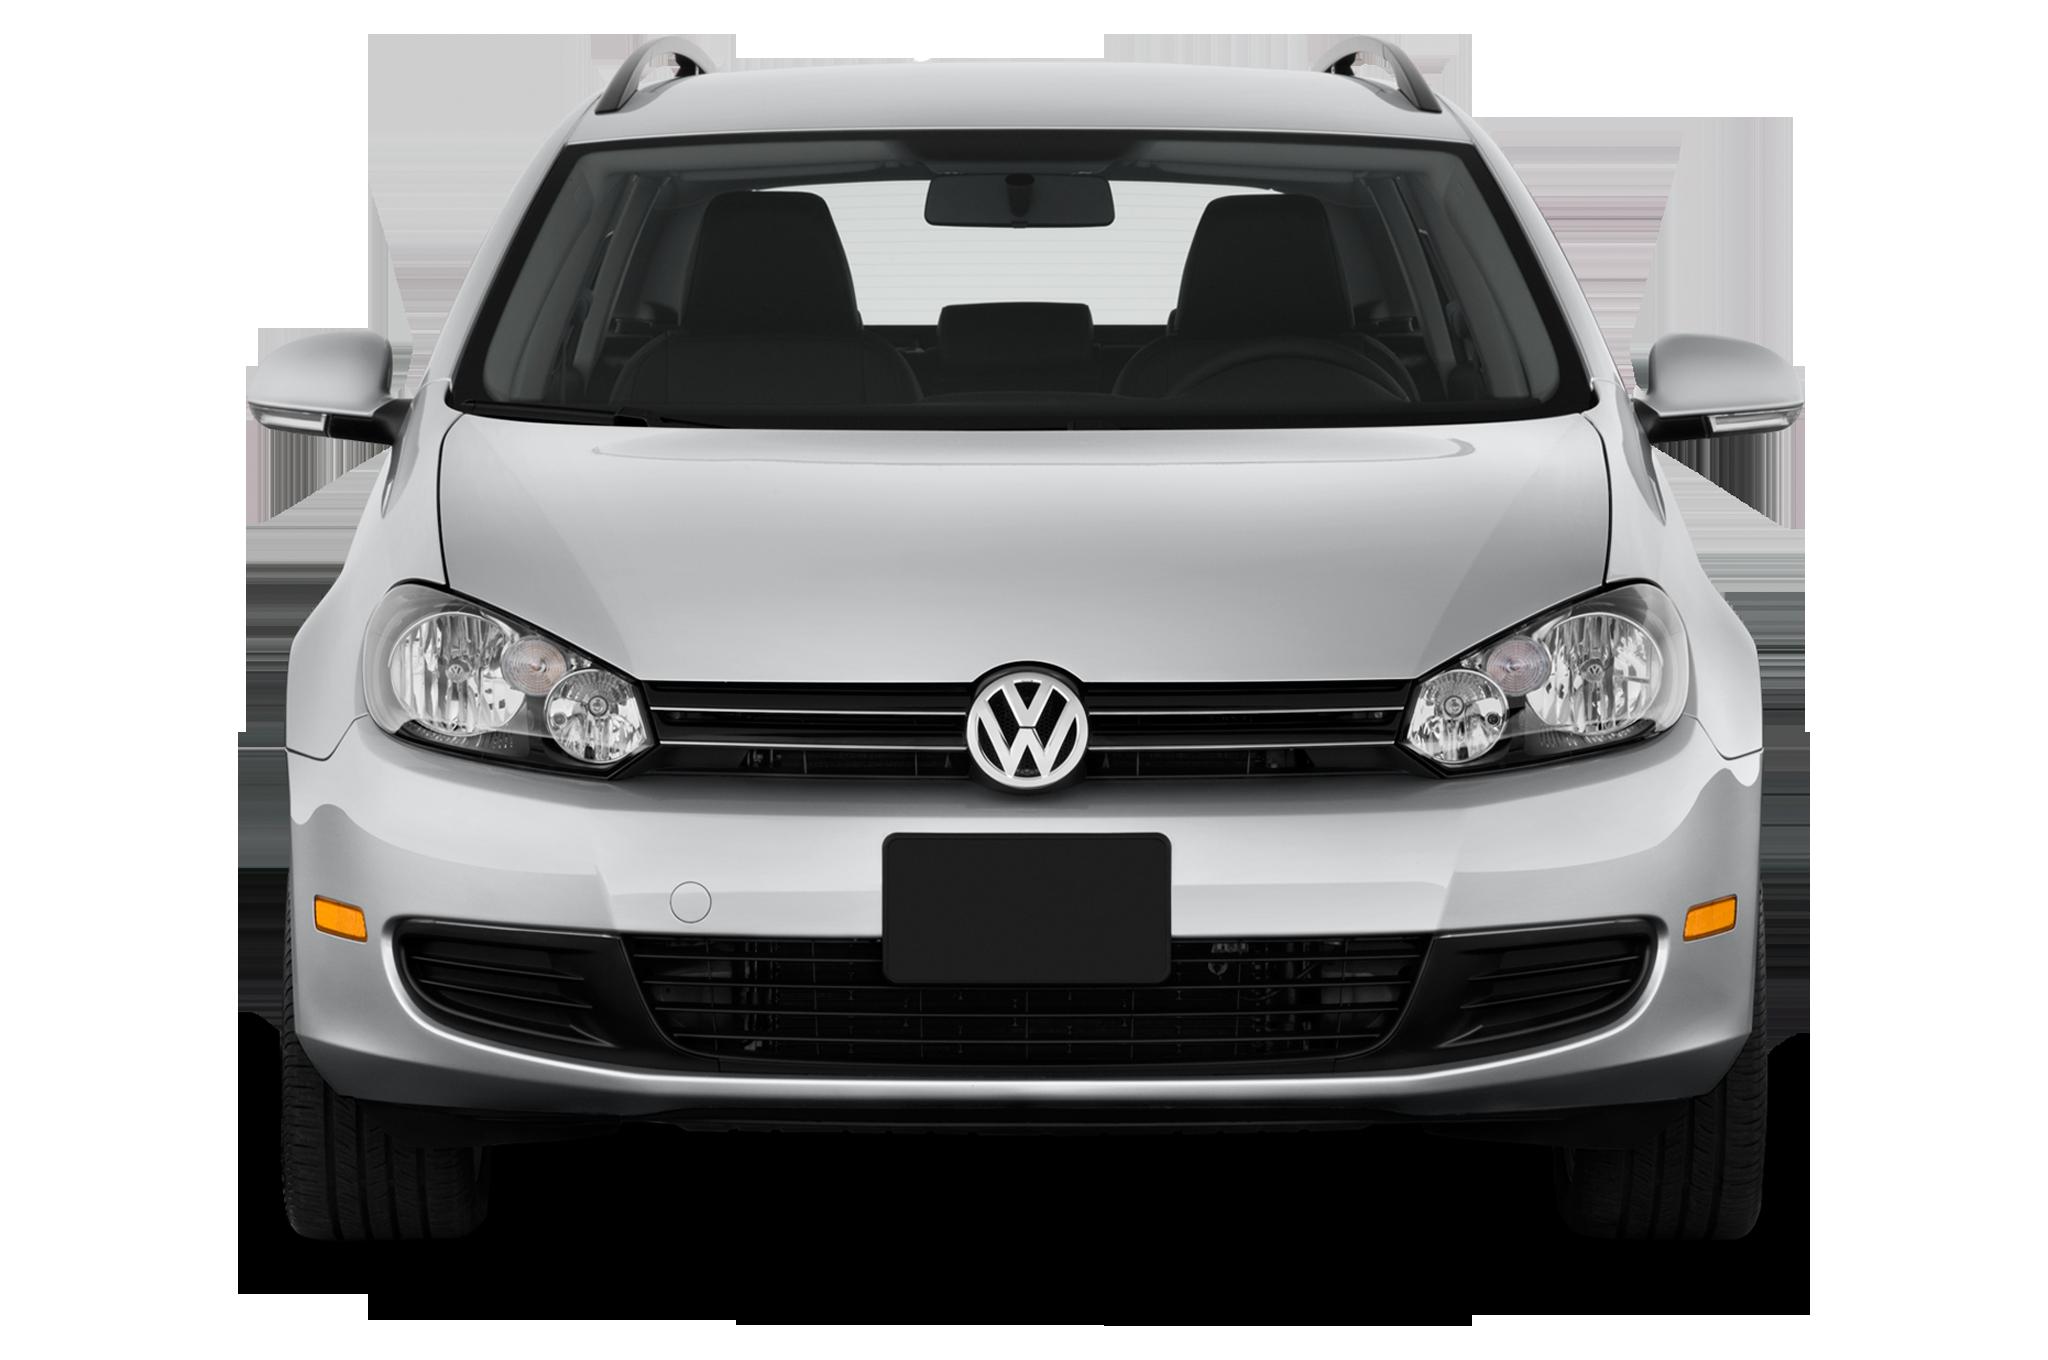 2010 Volkswagen Jetta Sportwagen Tdi Vw Midsize Sports Wagon Sedan 15 100